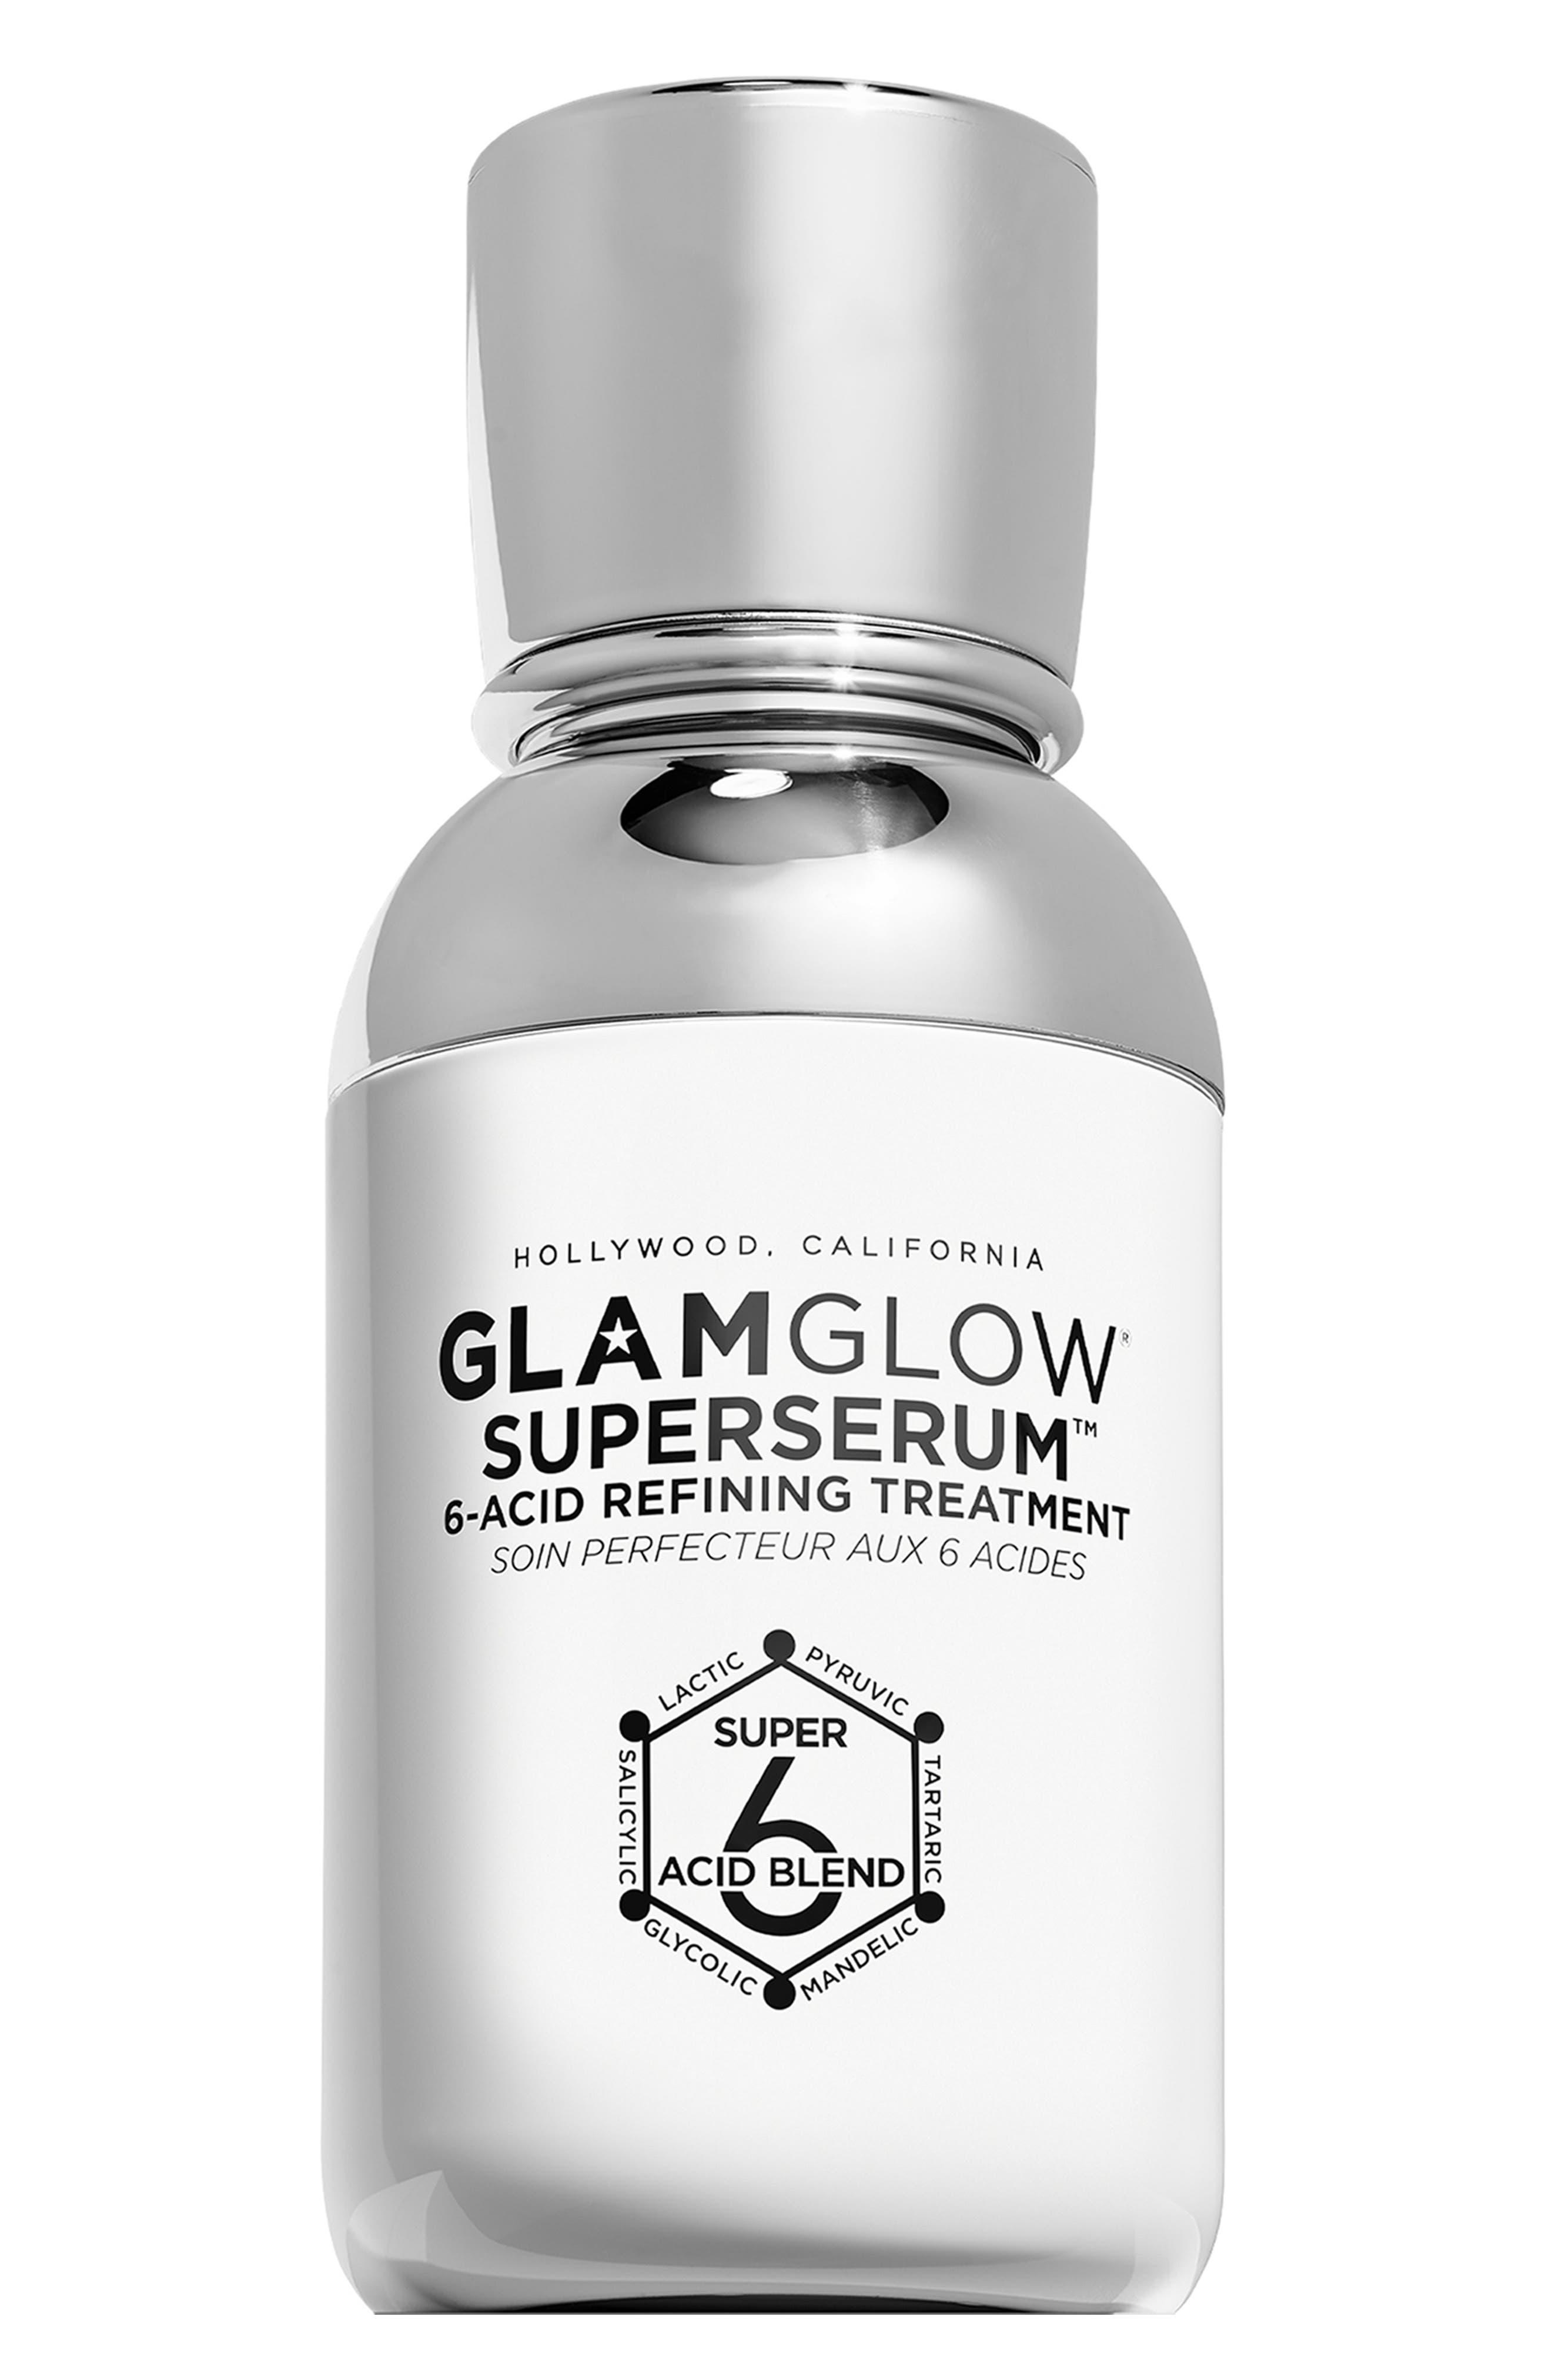 Glamglow Superserum(TM) 6-Acid Refining Treatment Serum